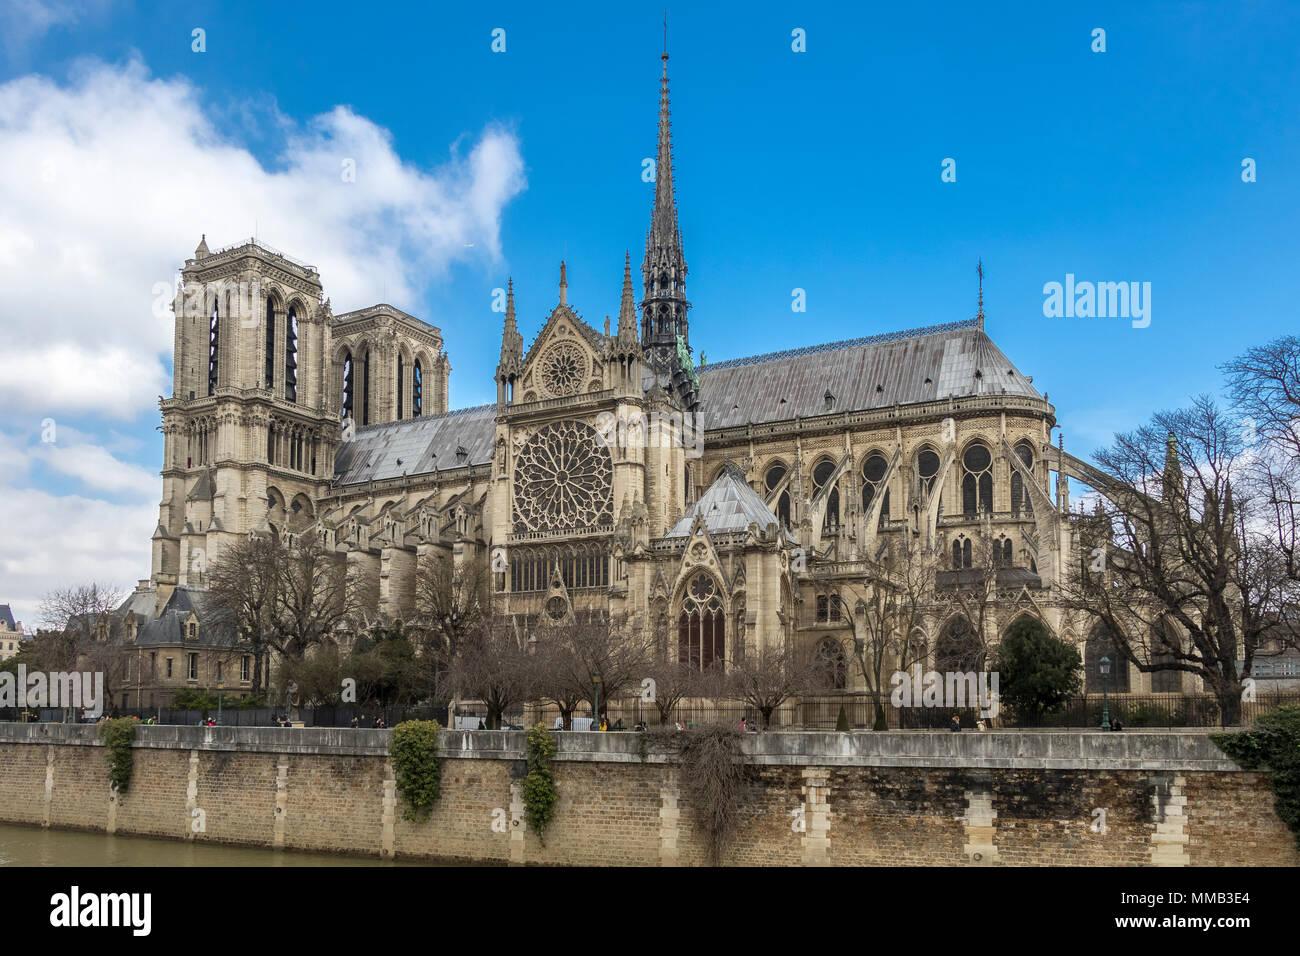 Die Kathedrale Notre Dame von Quai de Montebello, Paris, Frankreich Stockfoto